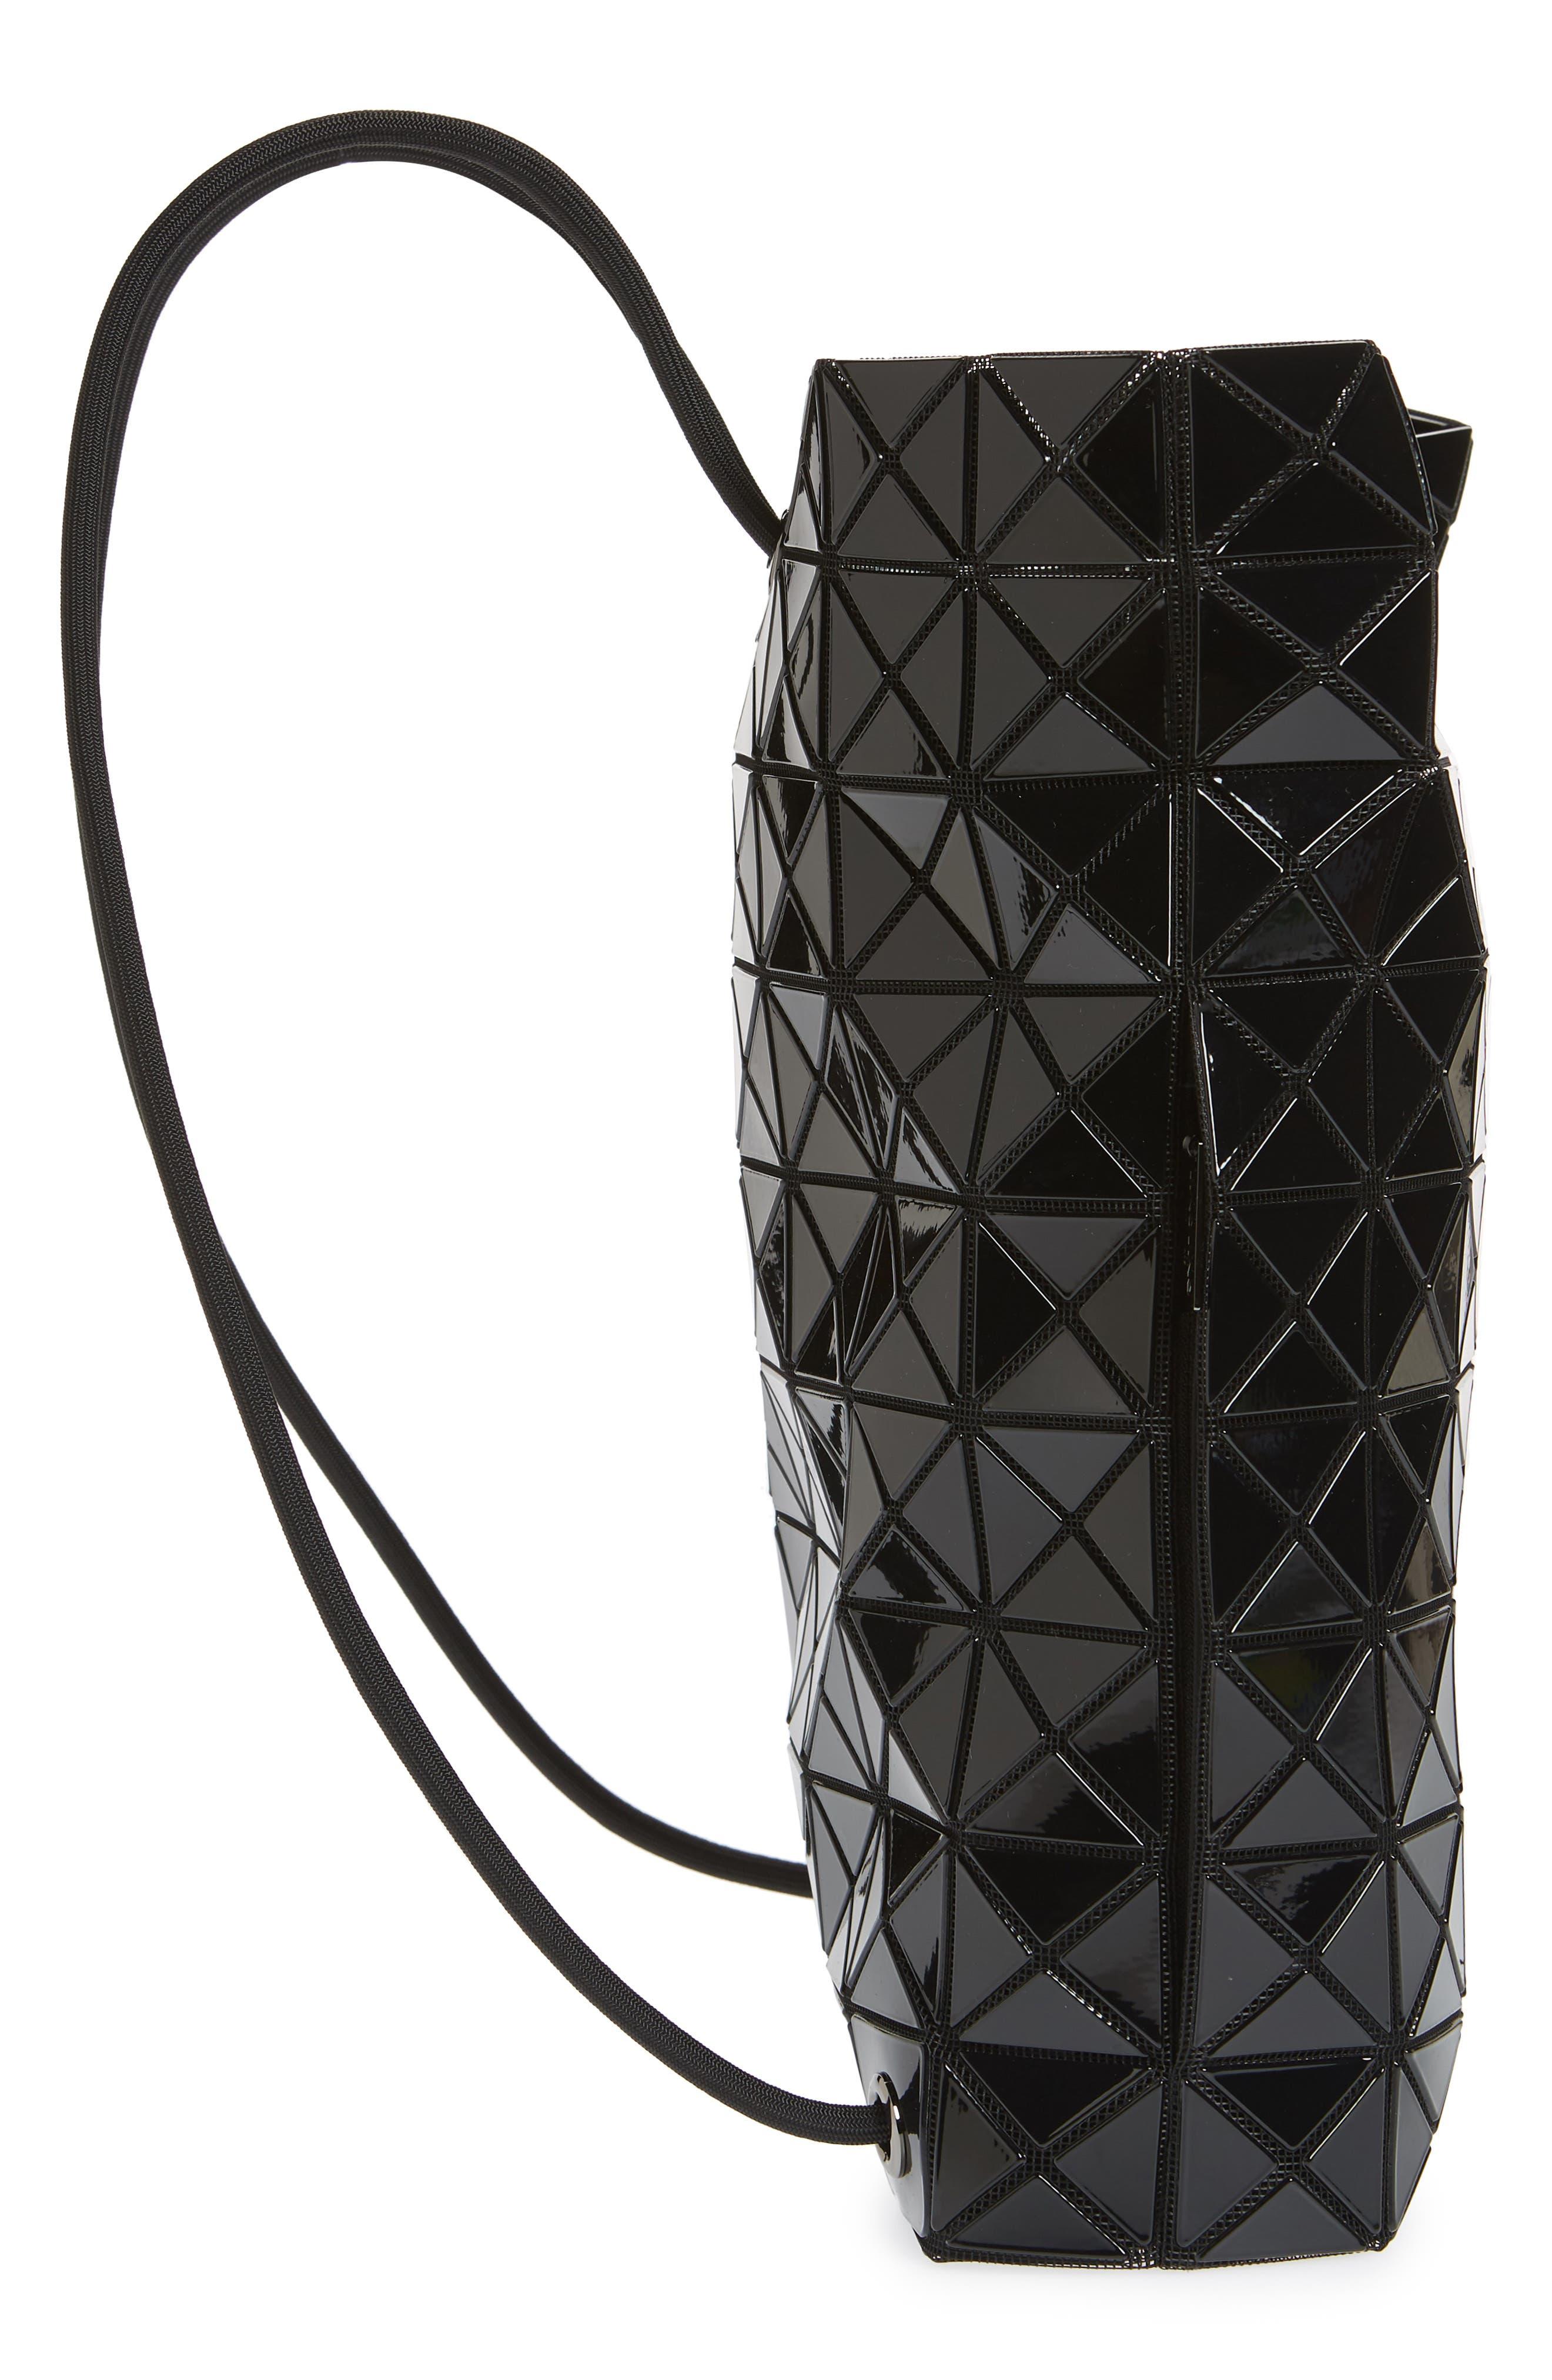 BAO BAO ISSEY MIYAKE, Wring Flat Backpack, Alternate thumbnail 6, color, BLACK